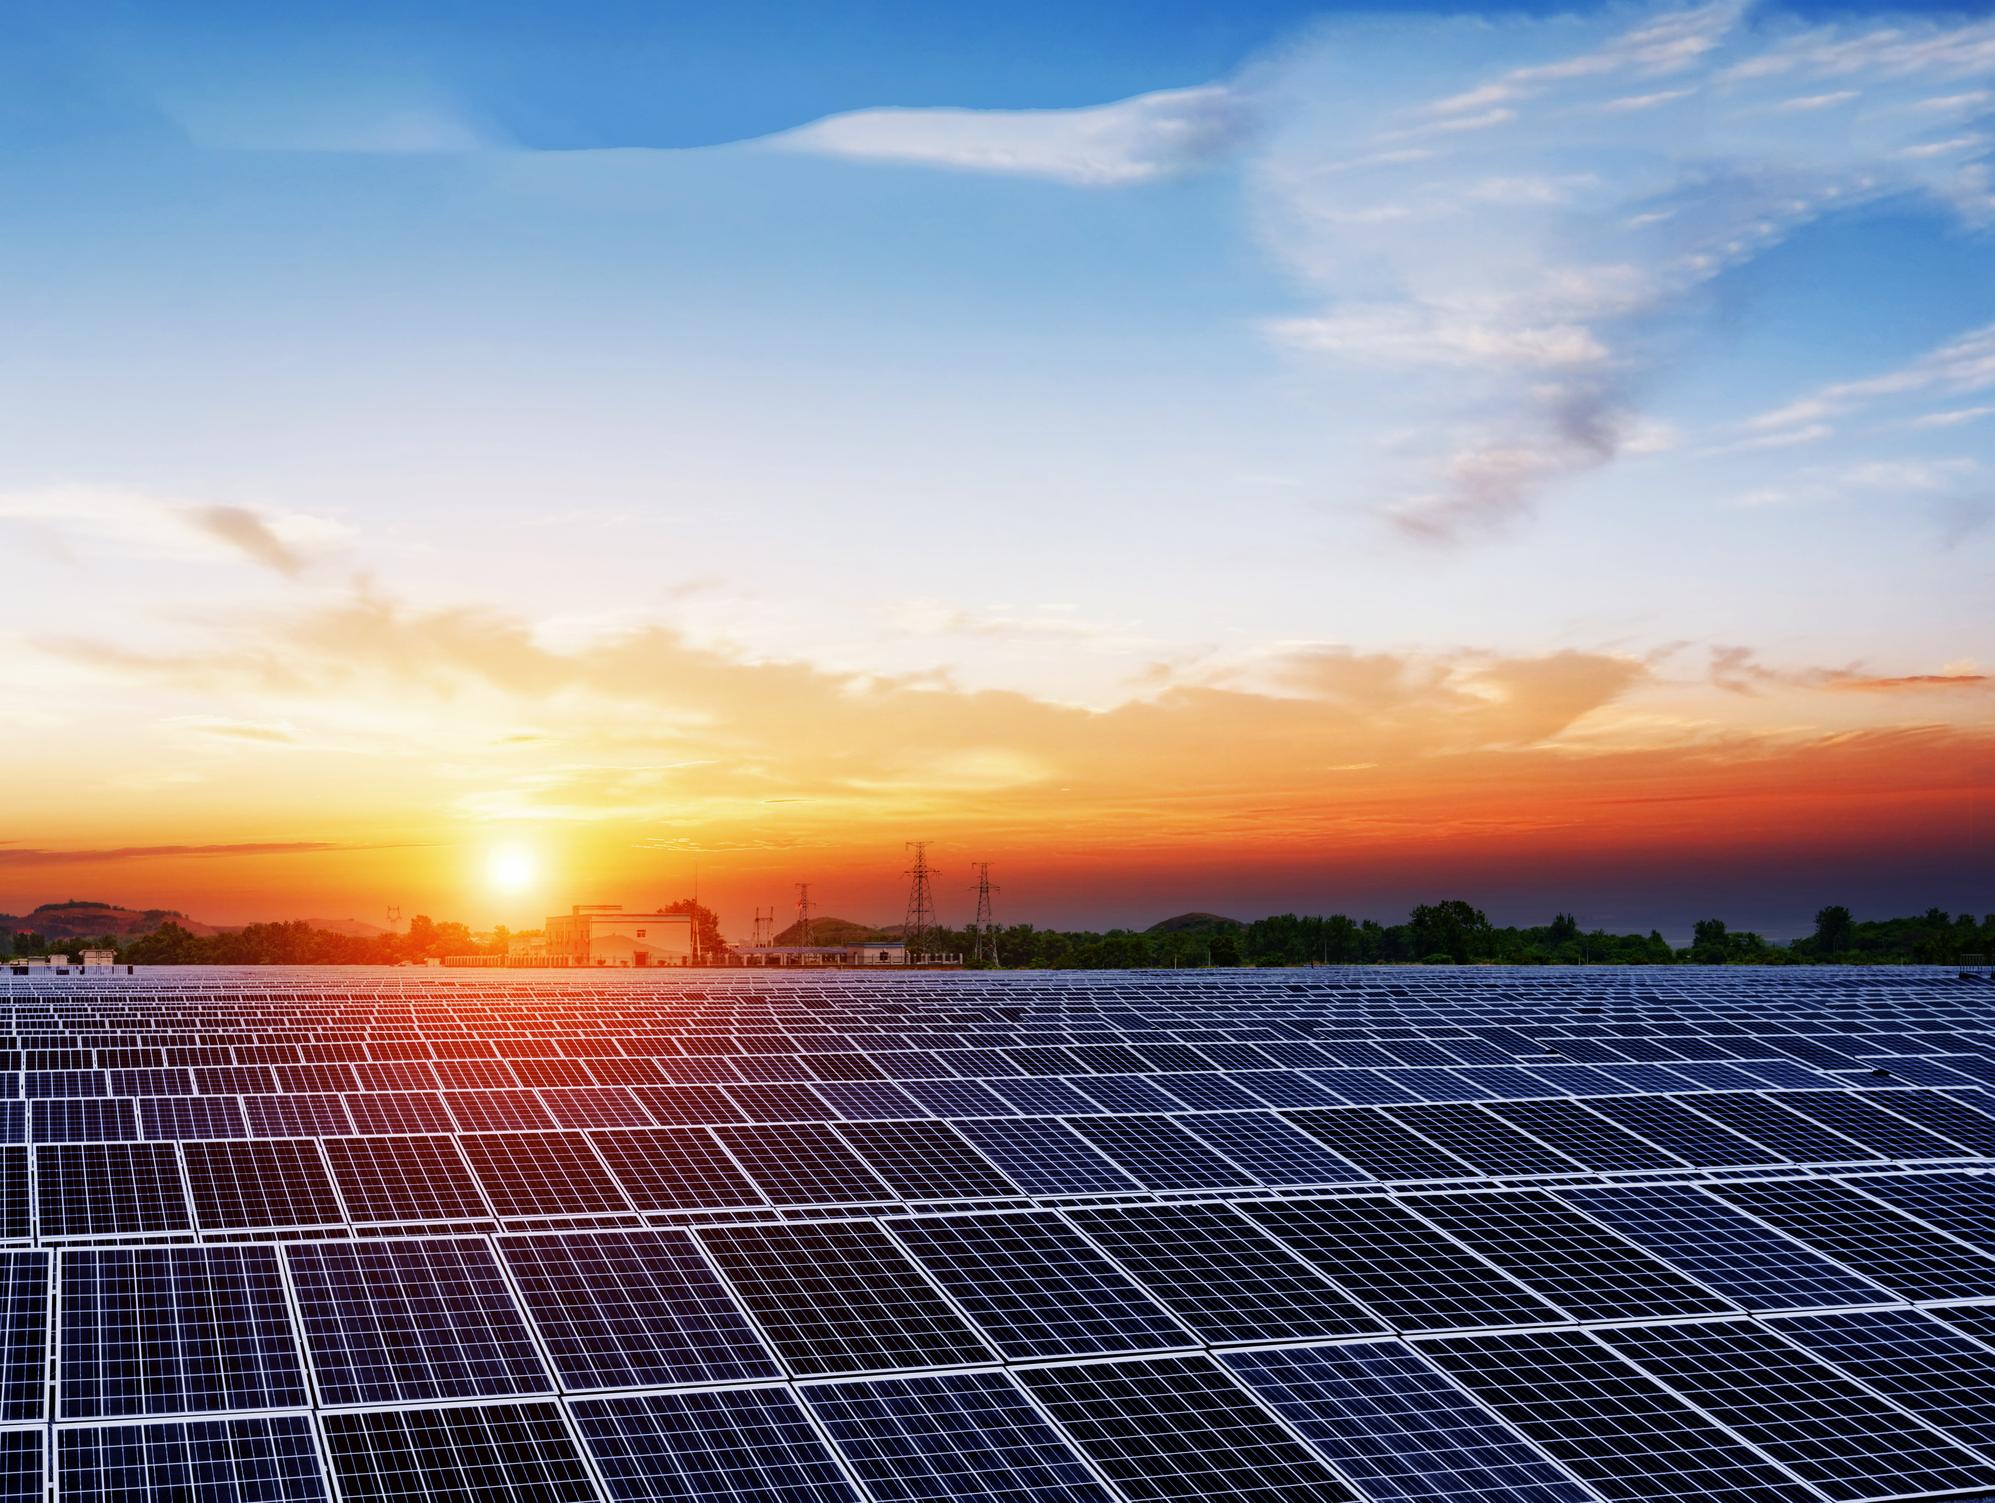 Solar panels under a blue sky at sunset.